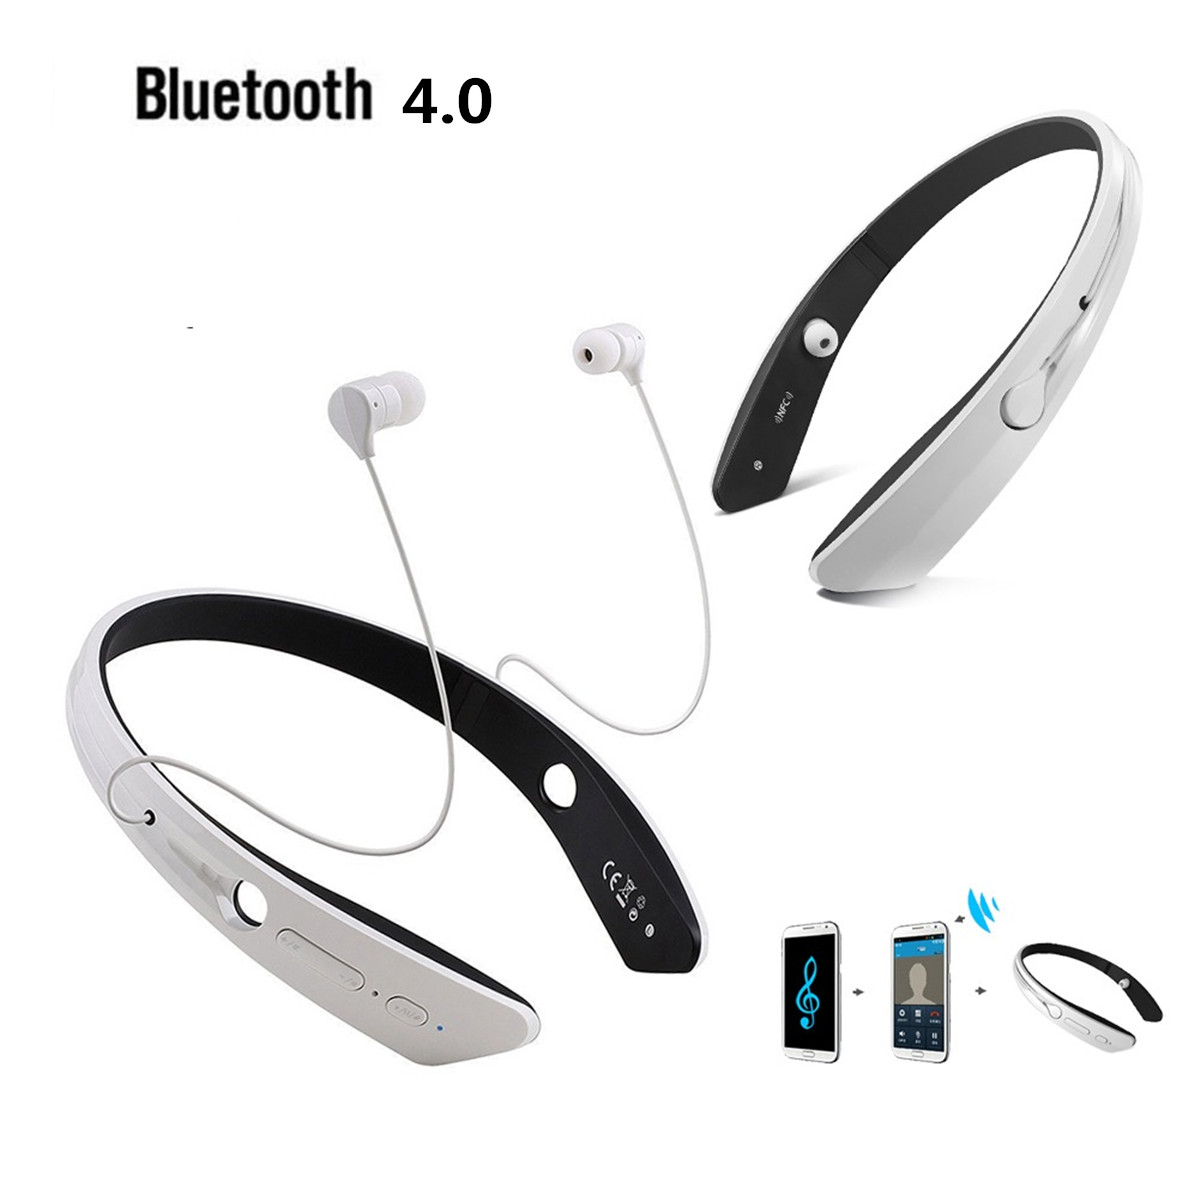 bm 170 sport wireless bluetooth stereo headset handsfree headphone white export lazada singapore. Black Bedroom Furniture Sets. Home Design Ideas